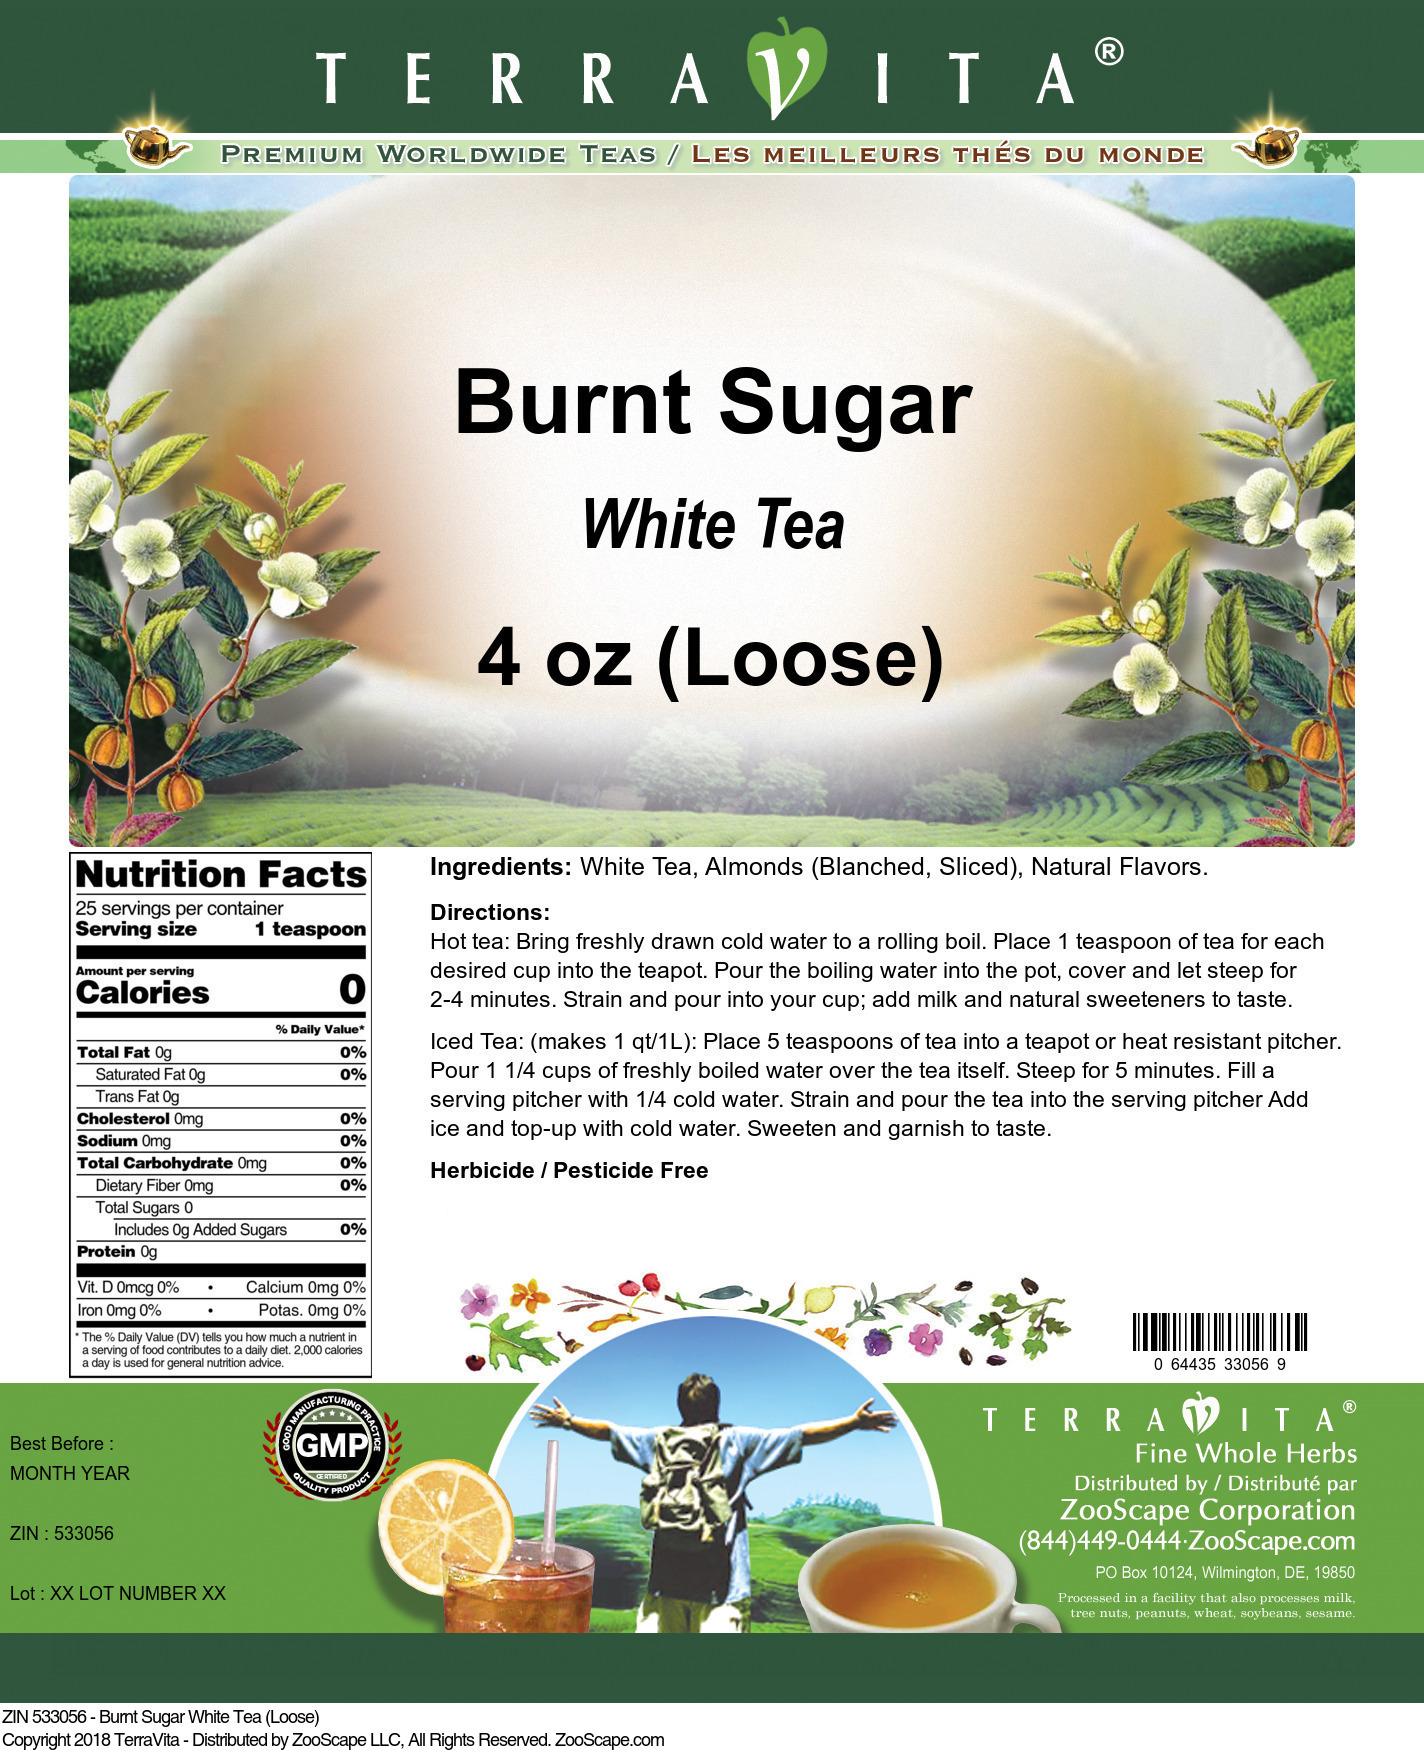 Burnt Sugar White Tea